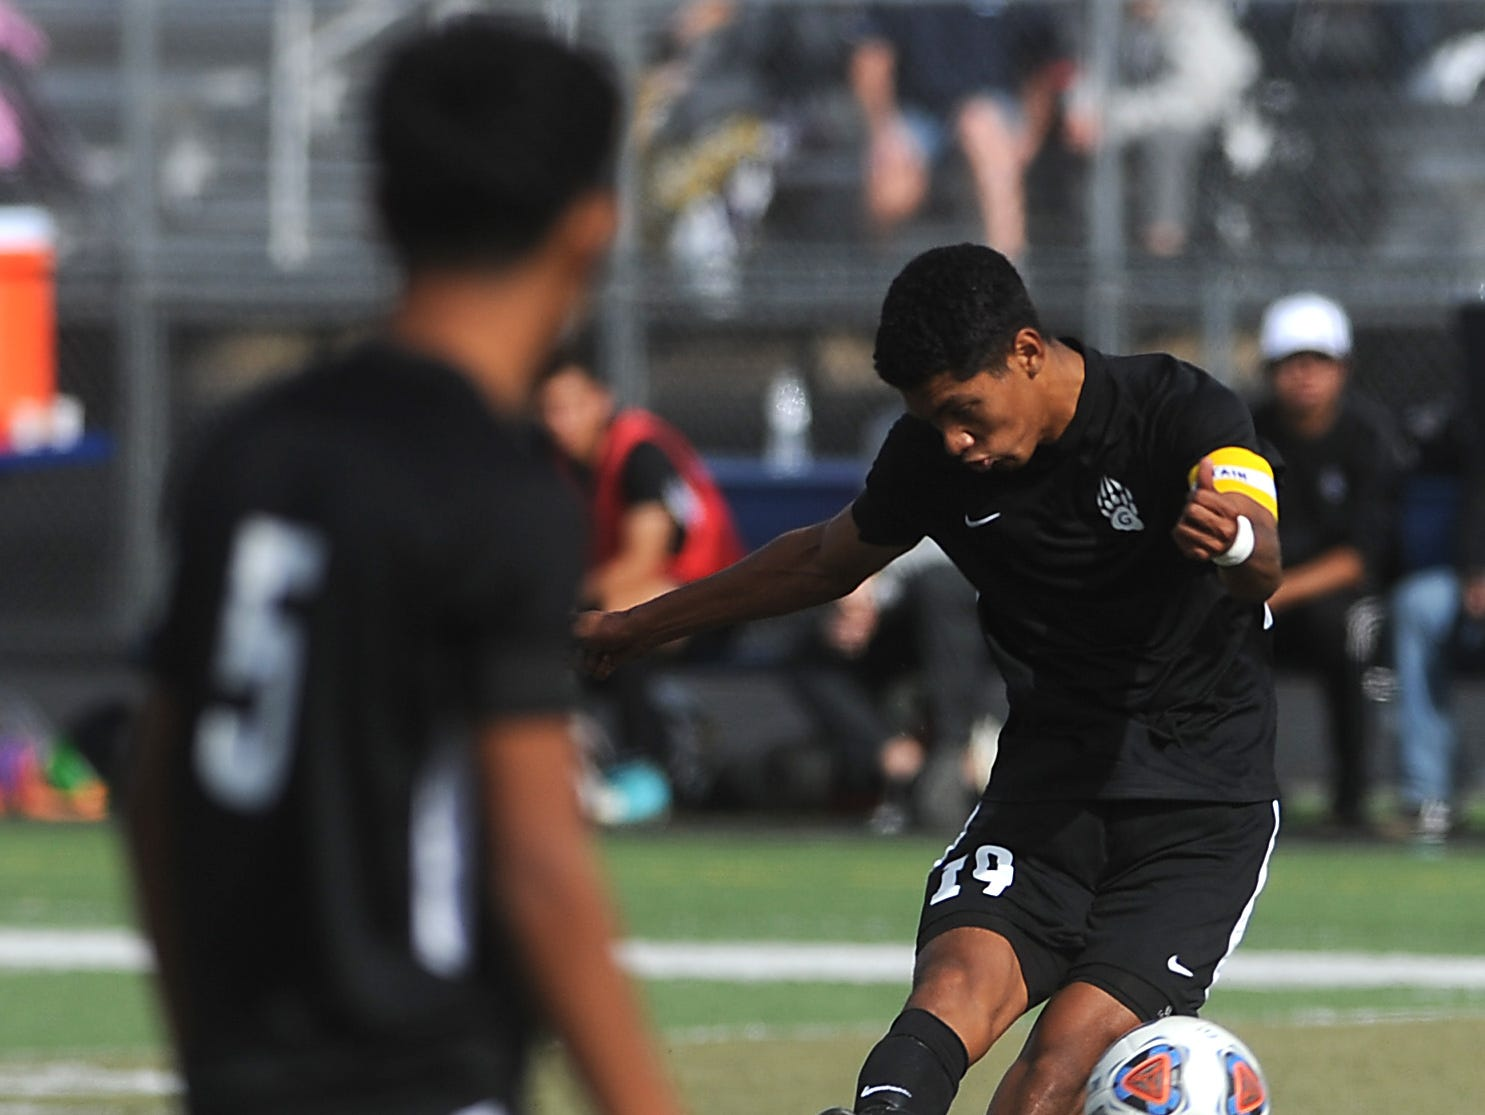 Galena's Jesus Medina Alvarez scores on a free kick against Spanish Springs during their regional final soccer game at Damonte Ranch in Reno on Nov. 3, 2018.